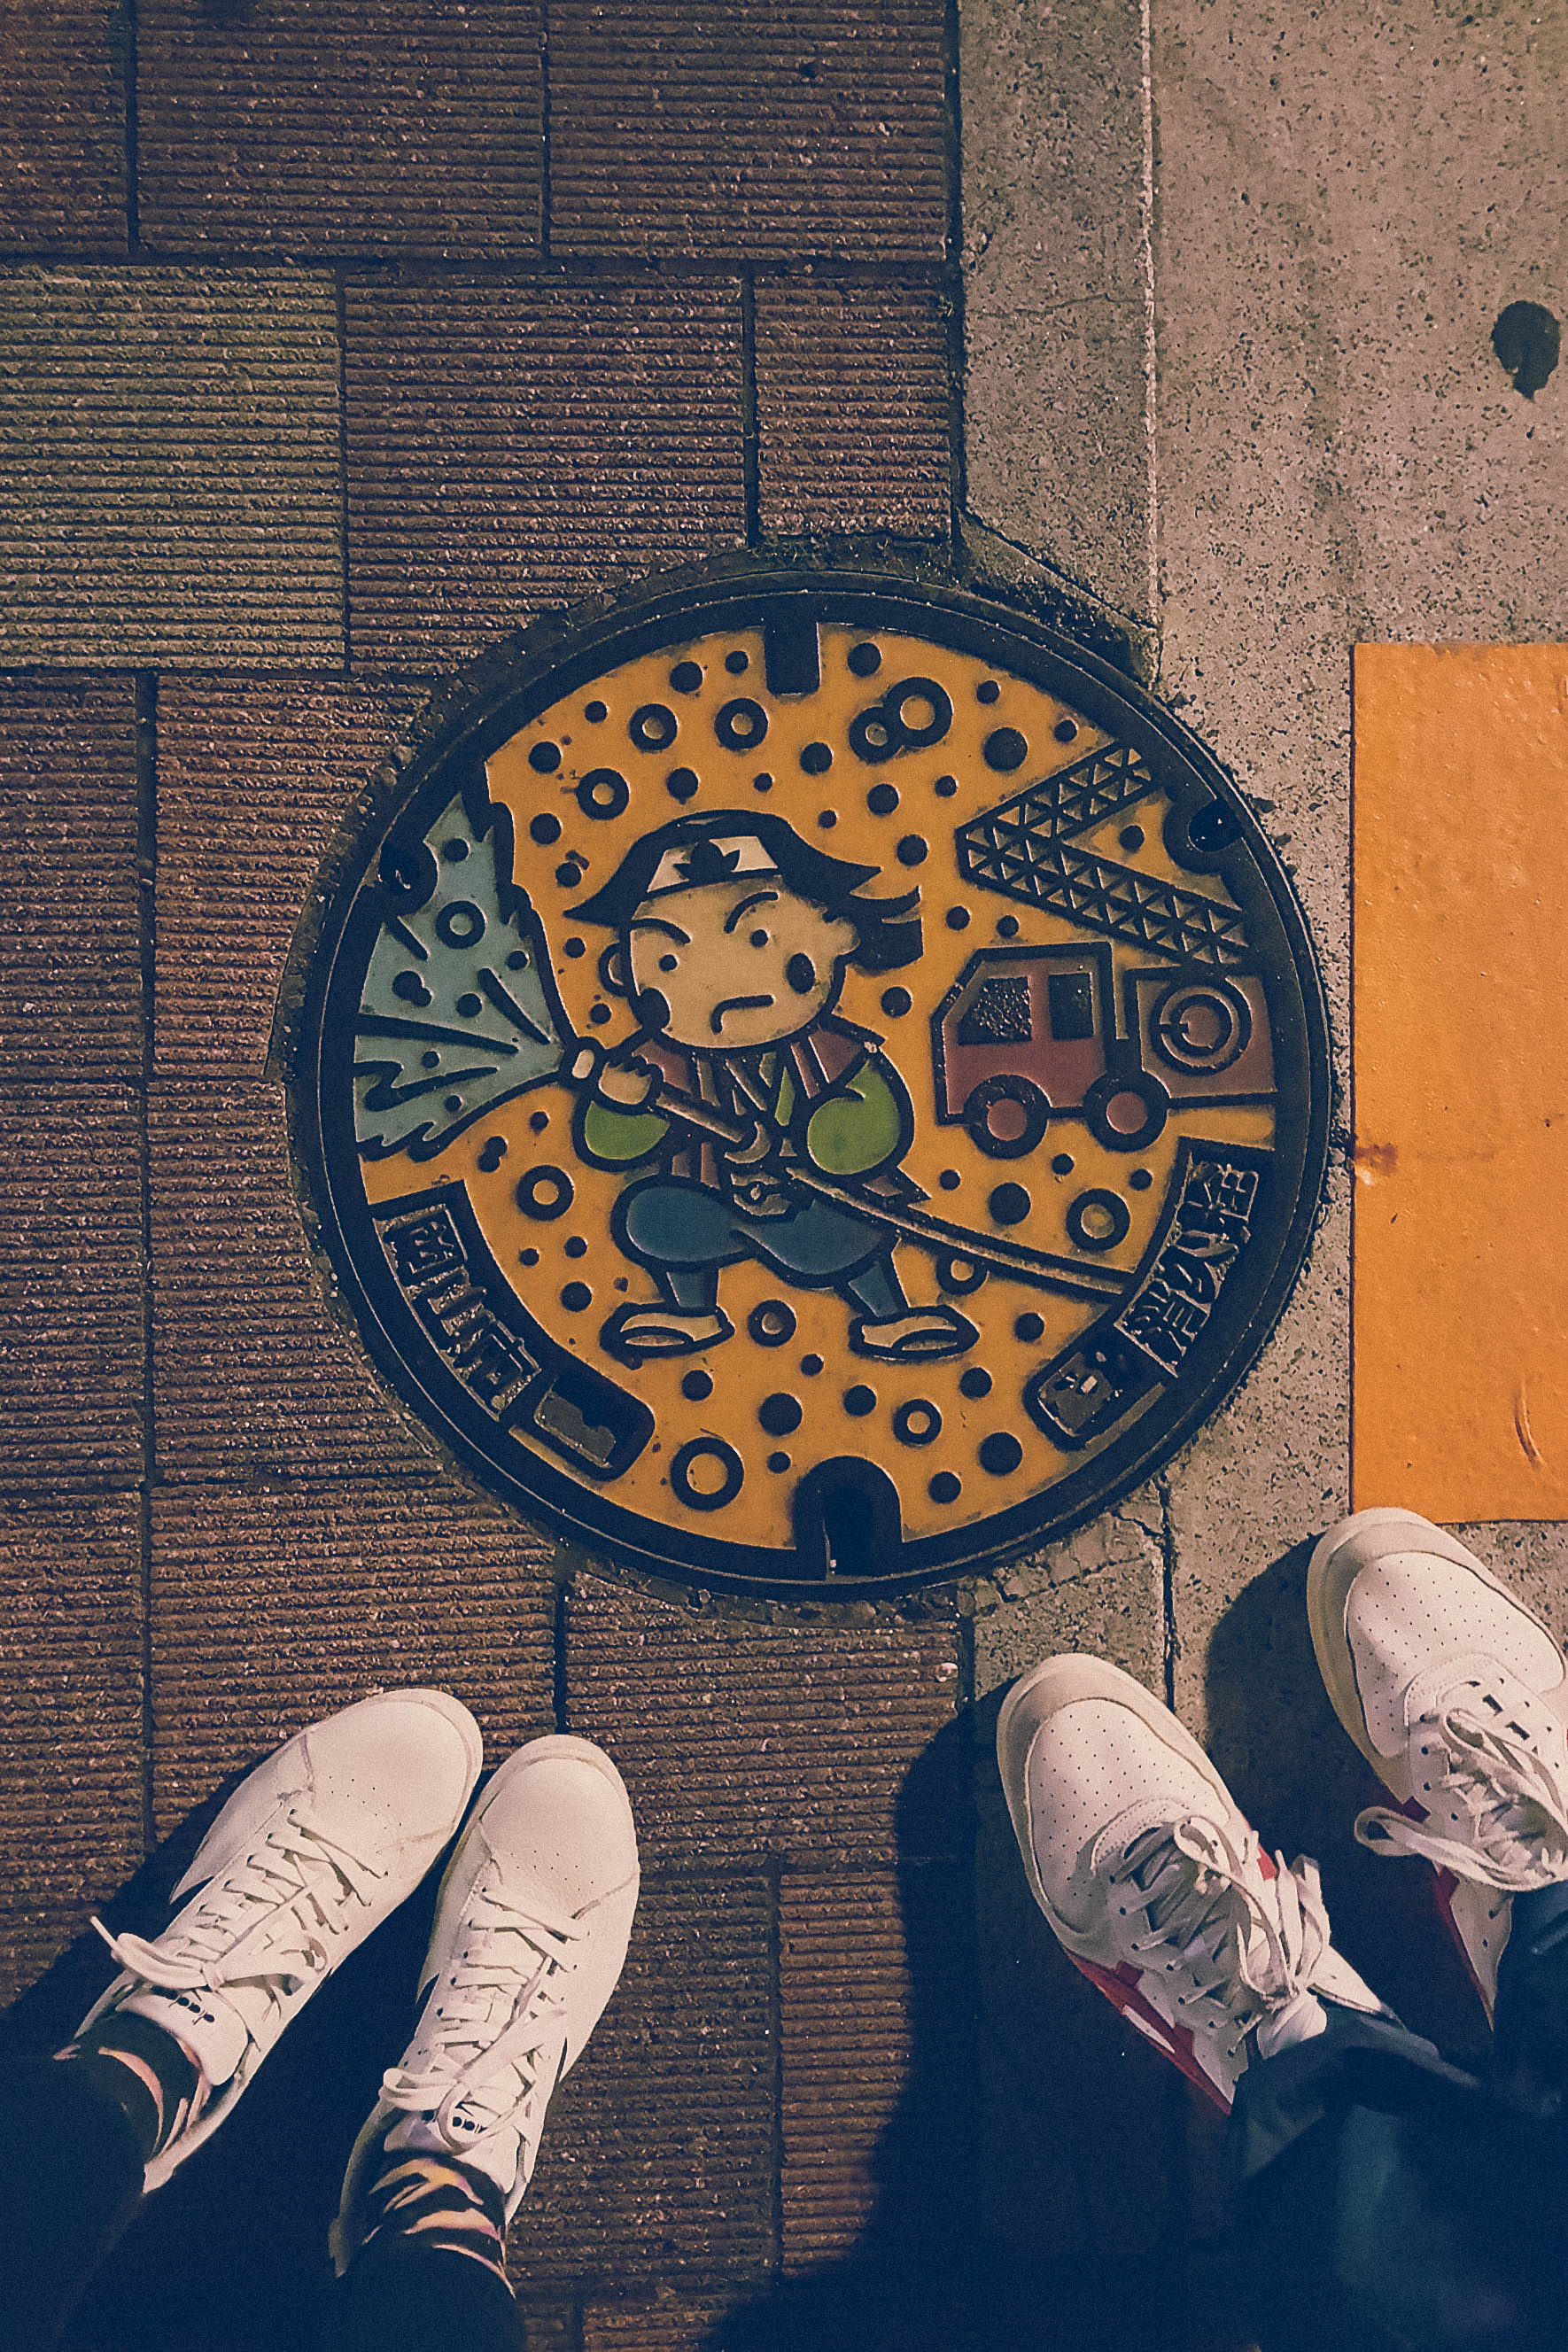 Manhole cover in Okayama